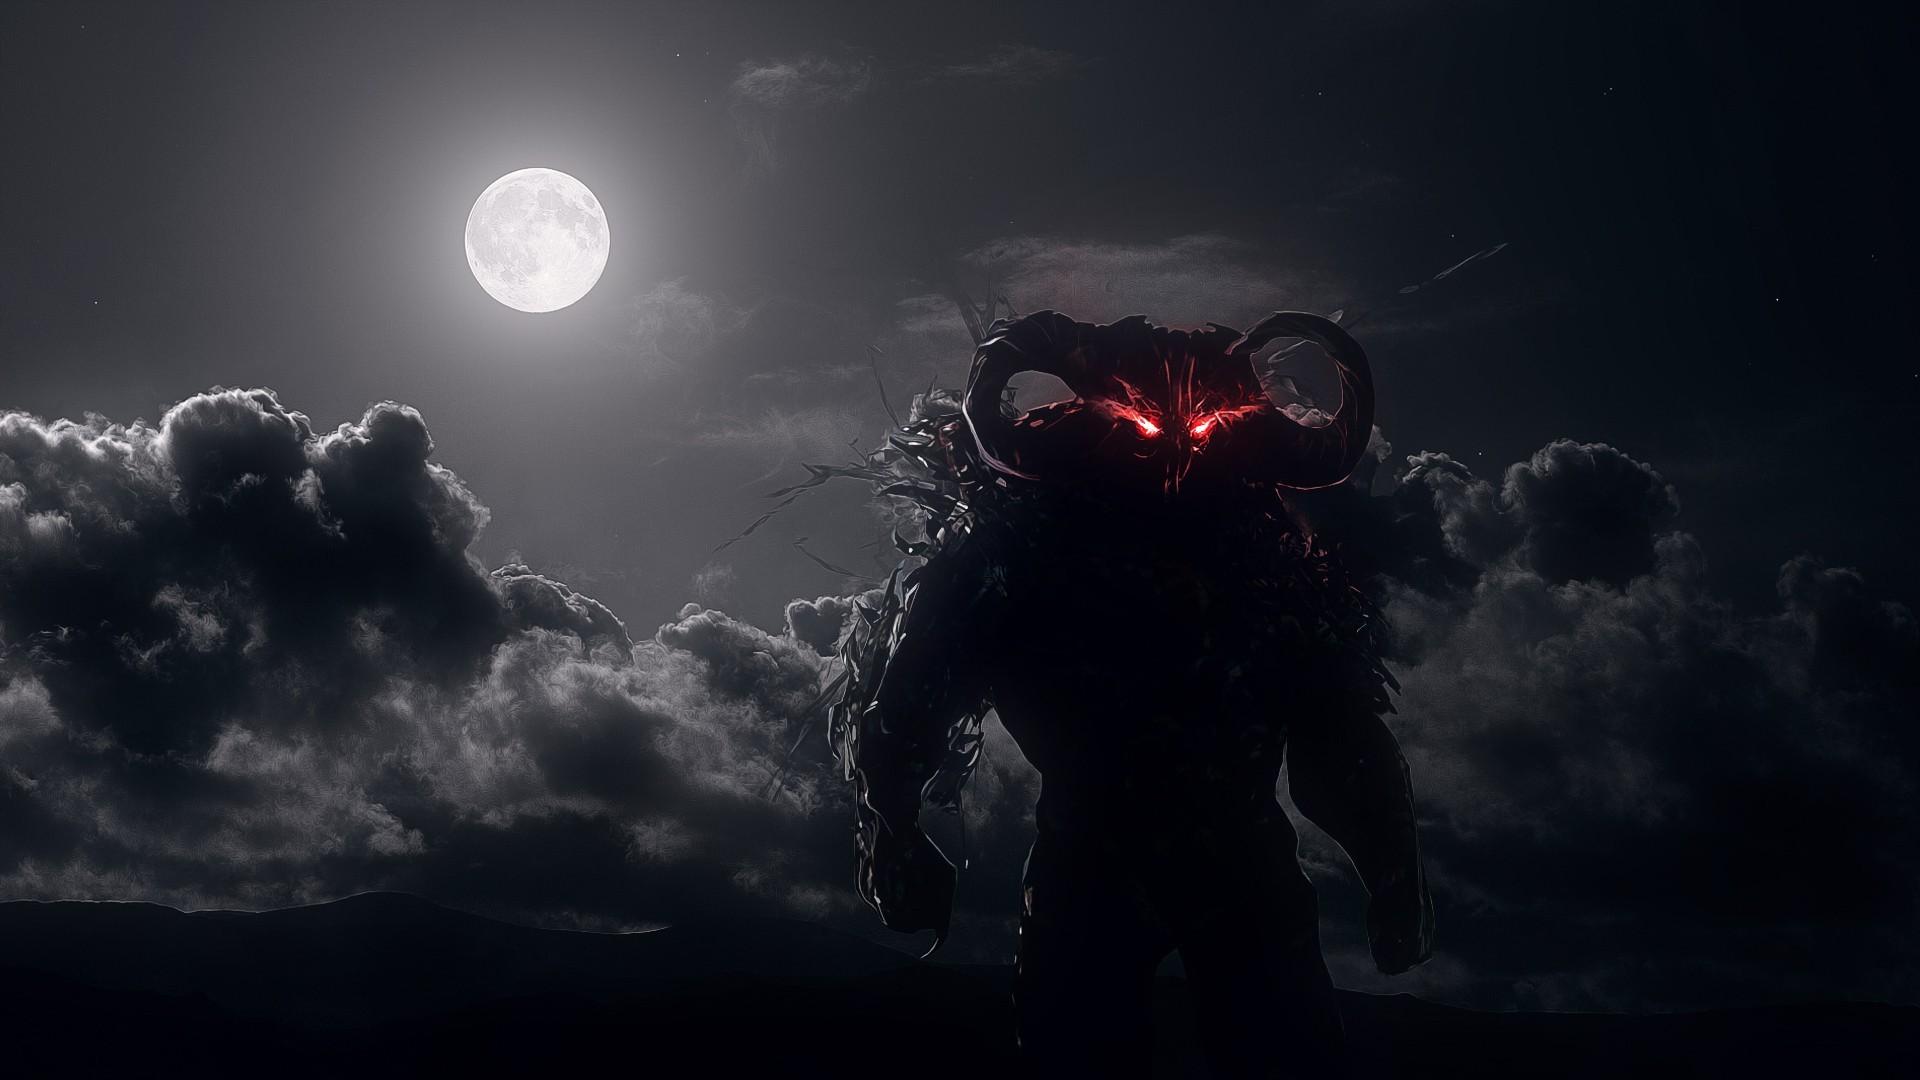 Video Games Dark Night Red Moon Moonlight Midnight Dahaka Prince Of Persia Warrior Within